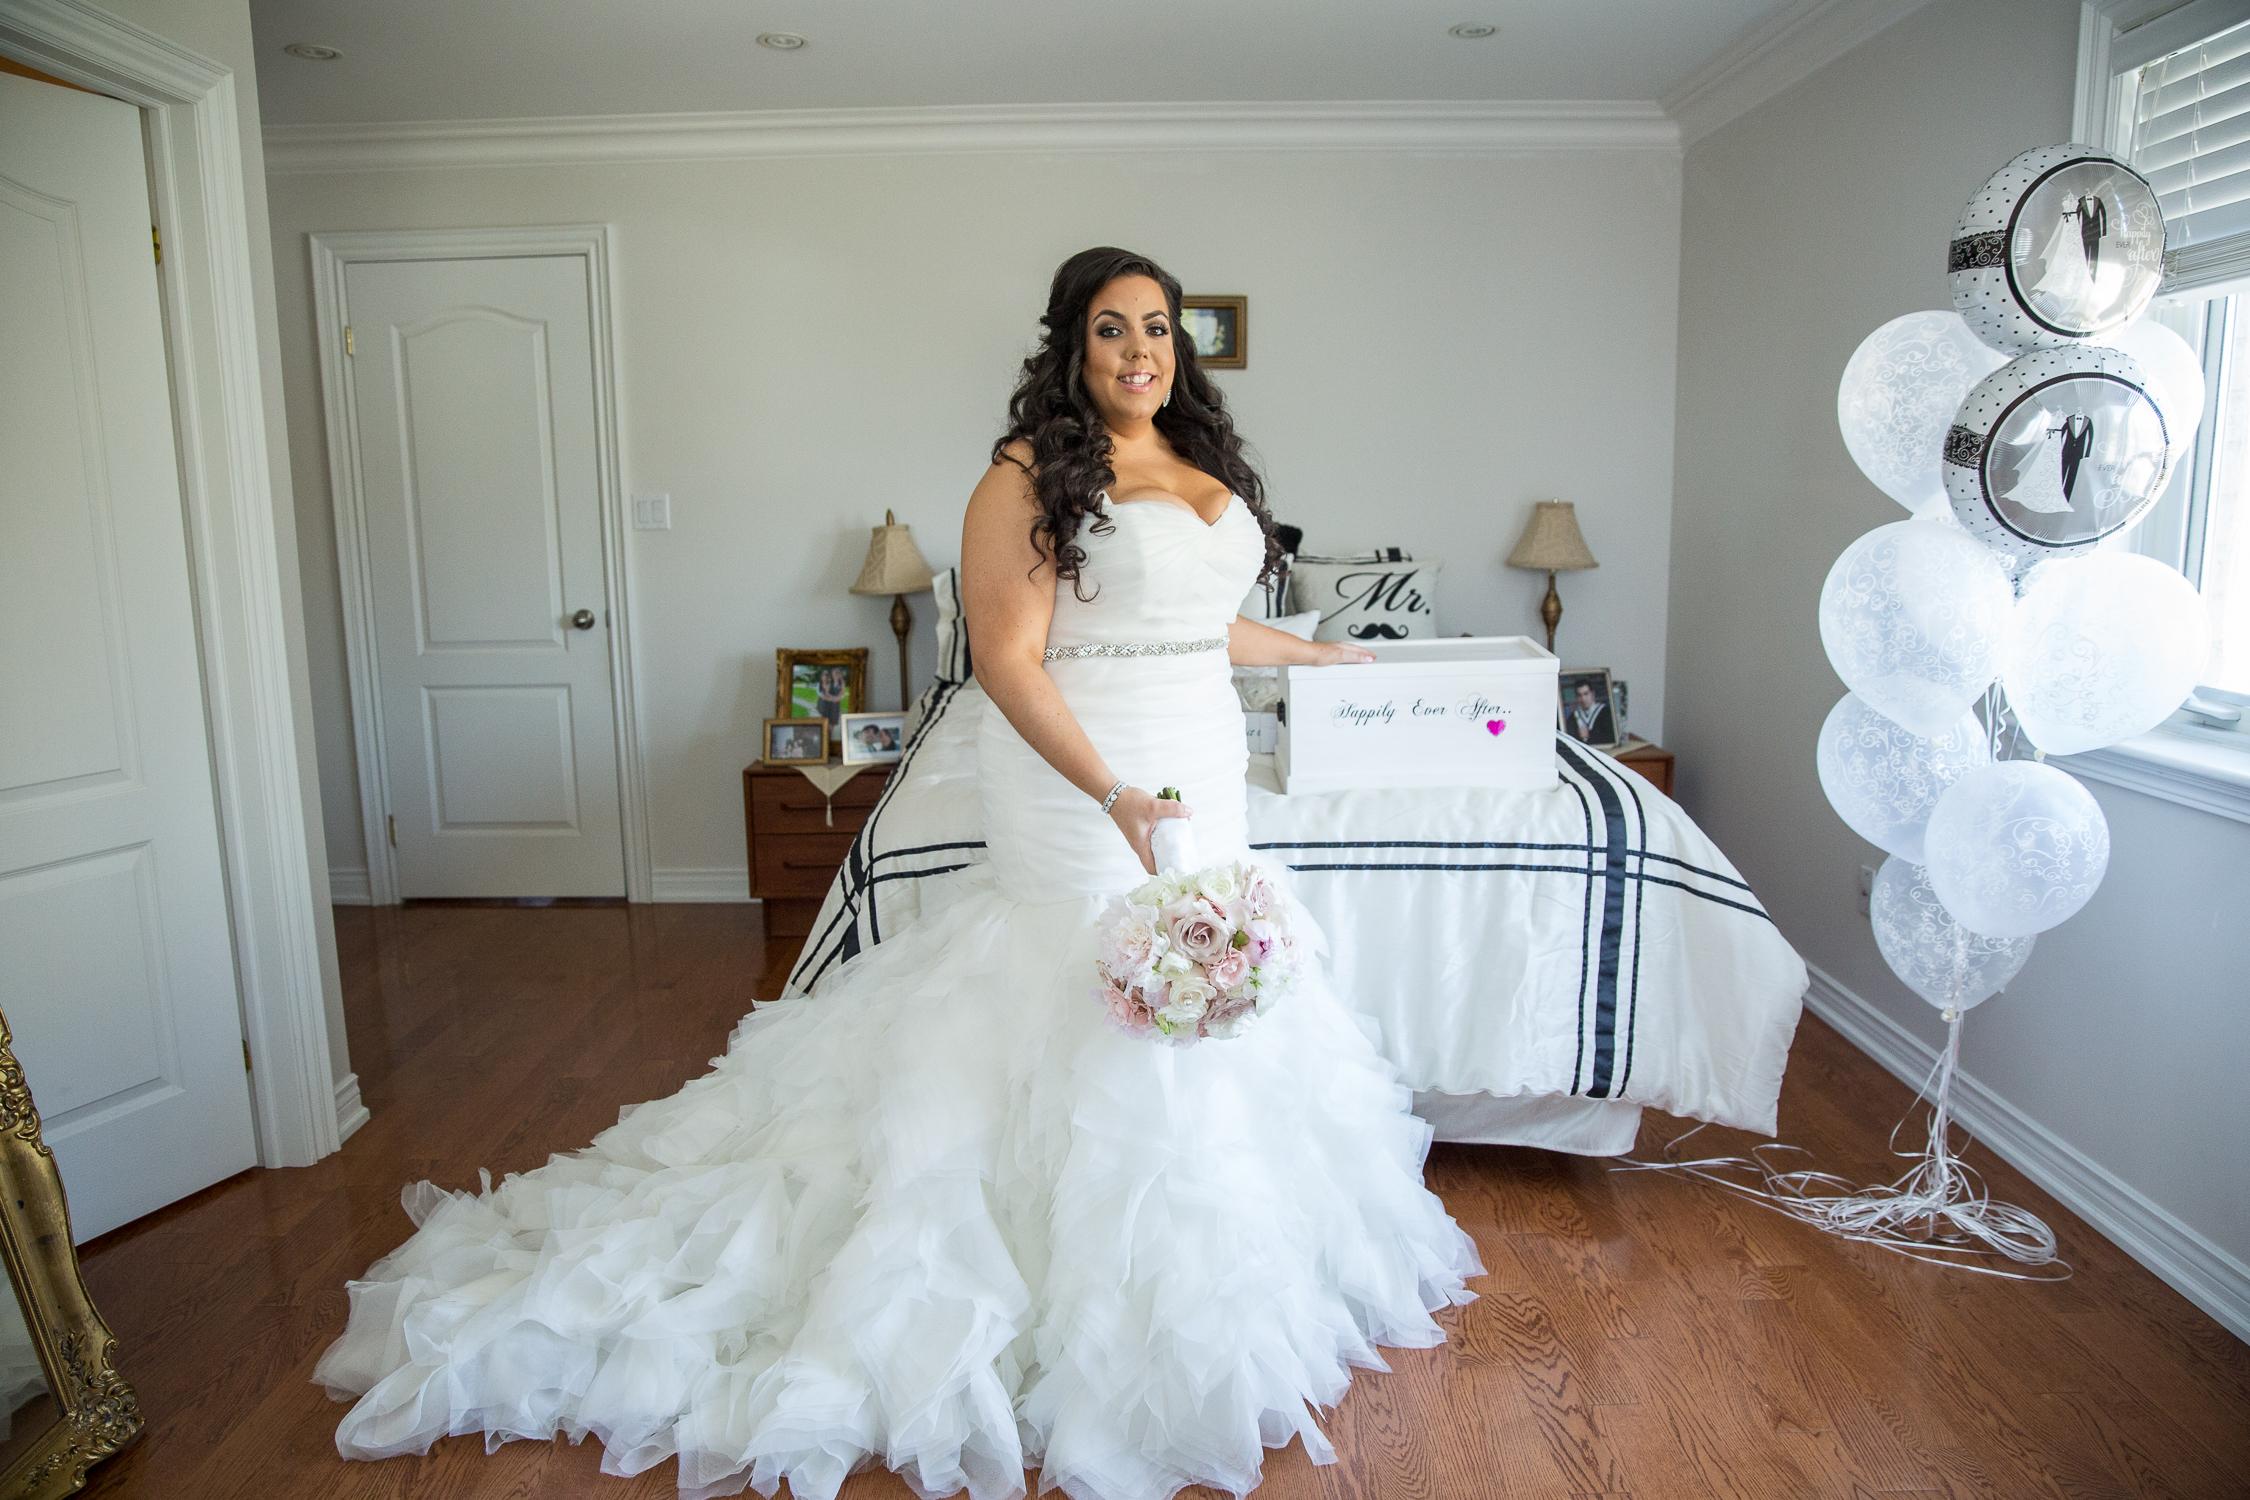 Peter-and-Marie-Wedding-Fontana-Primavera-Graydon-Hall-Manor-Toronto-Ontario-Canada-0011.jpg